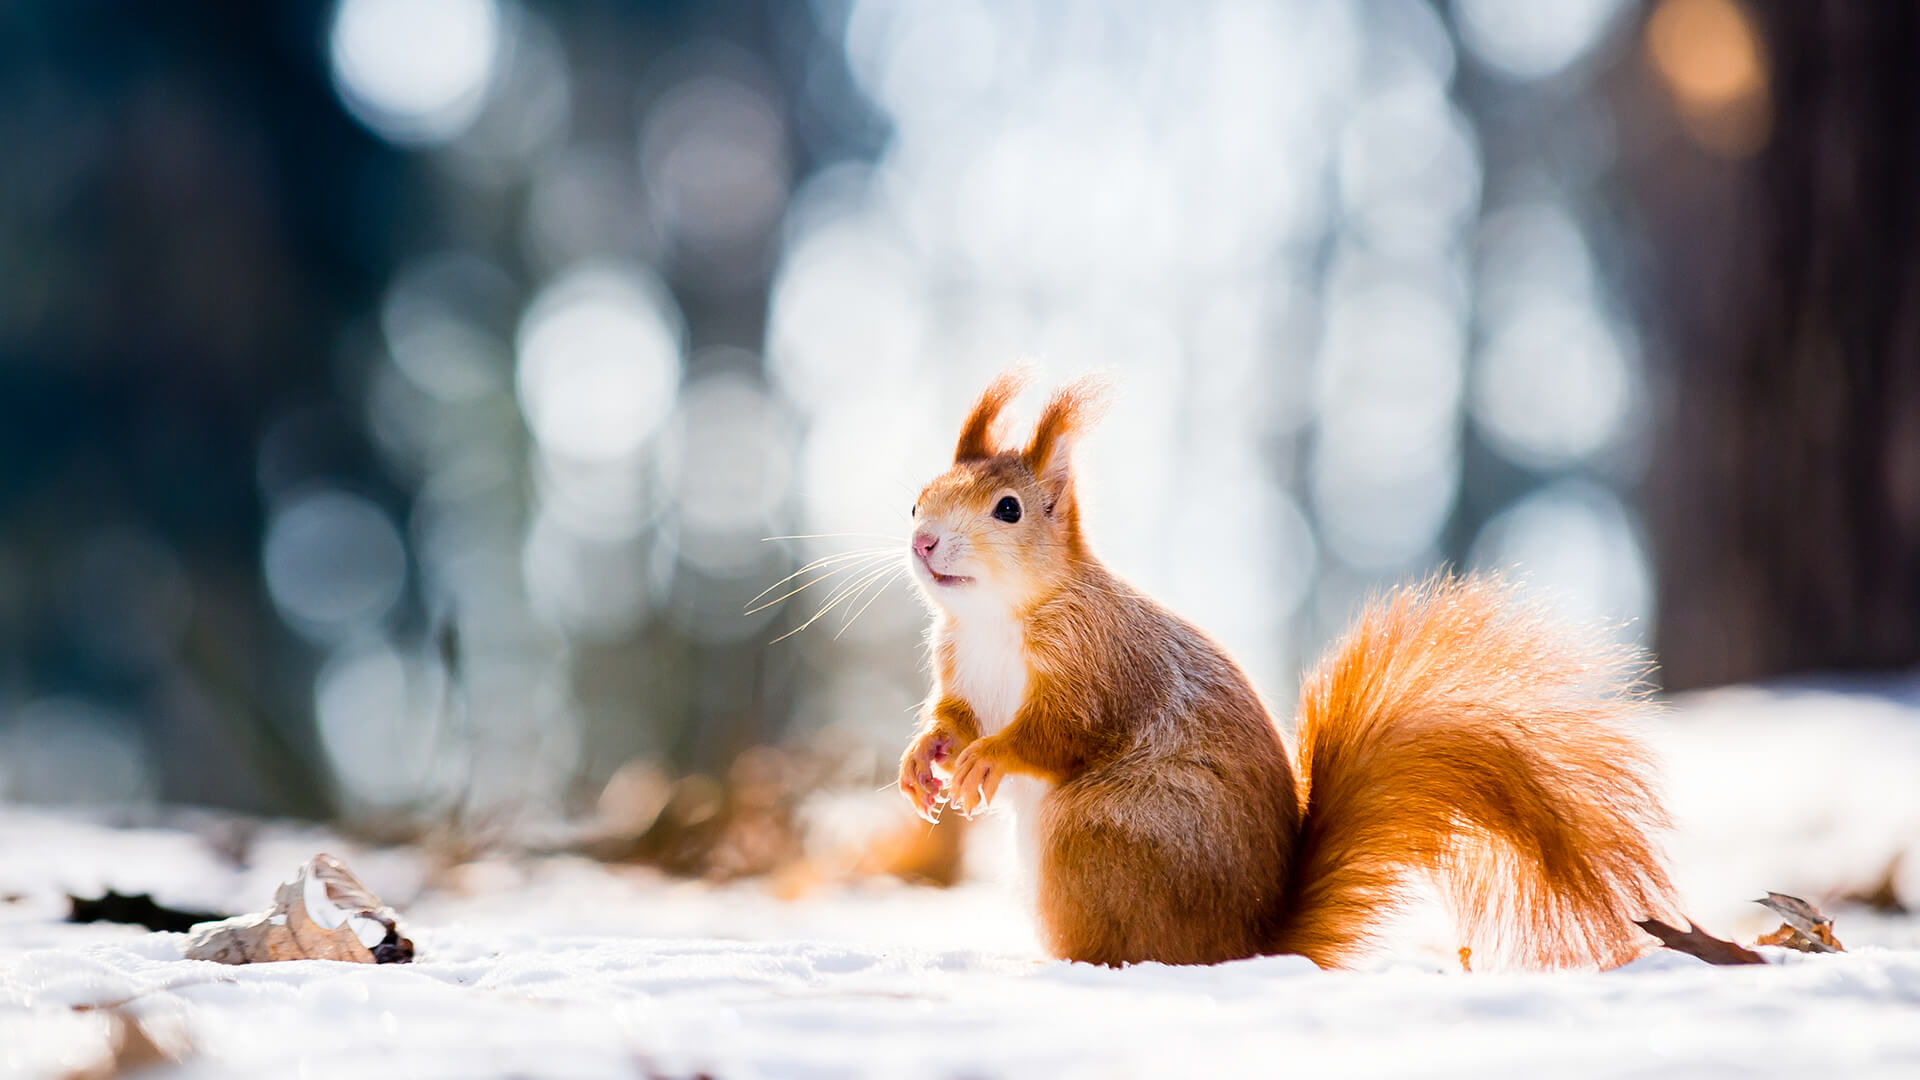 December Wildlife Guide